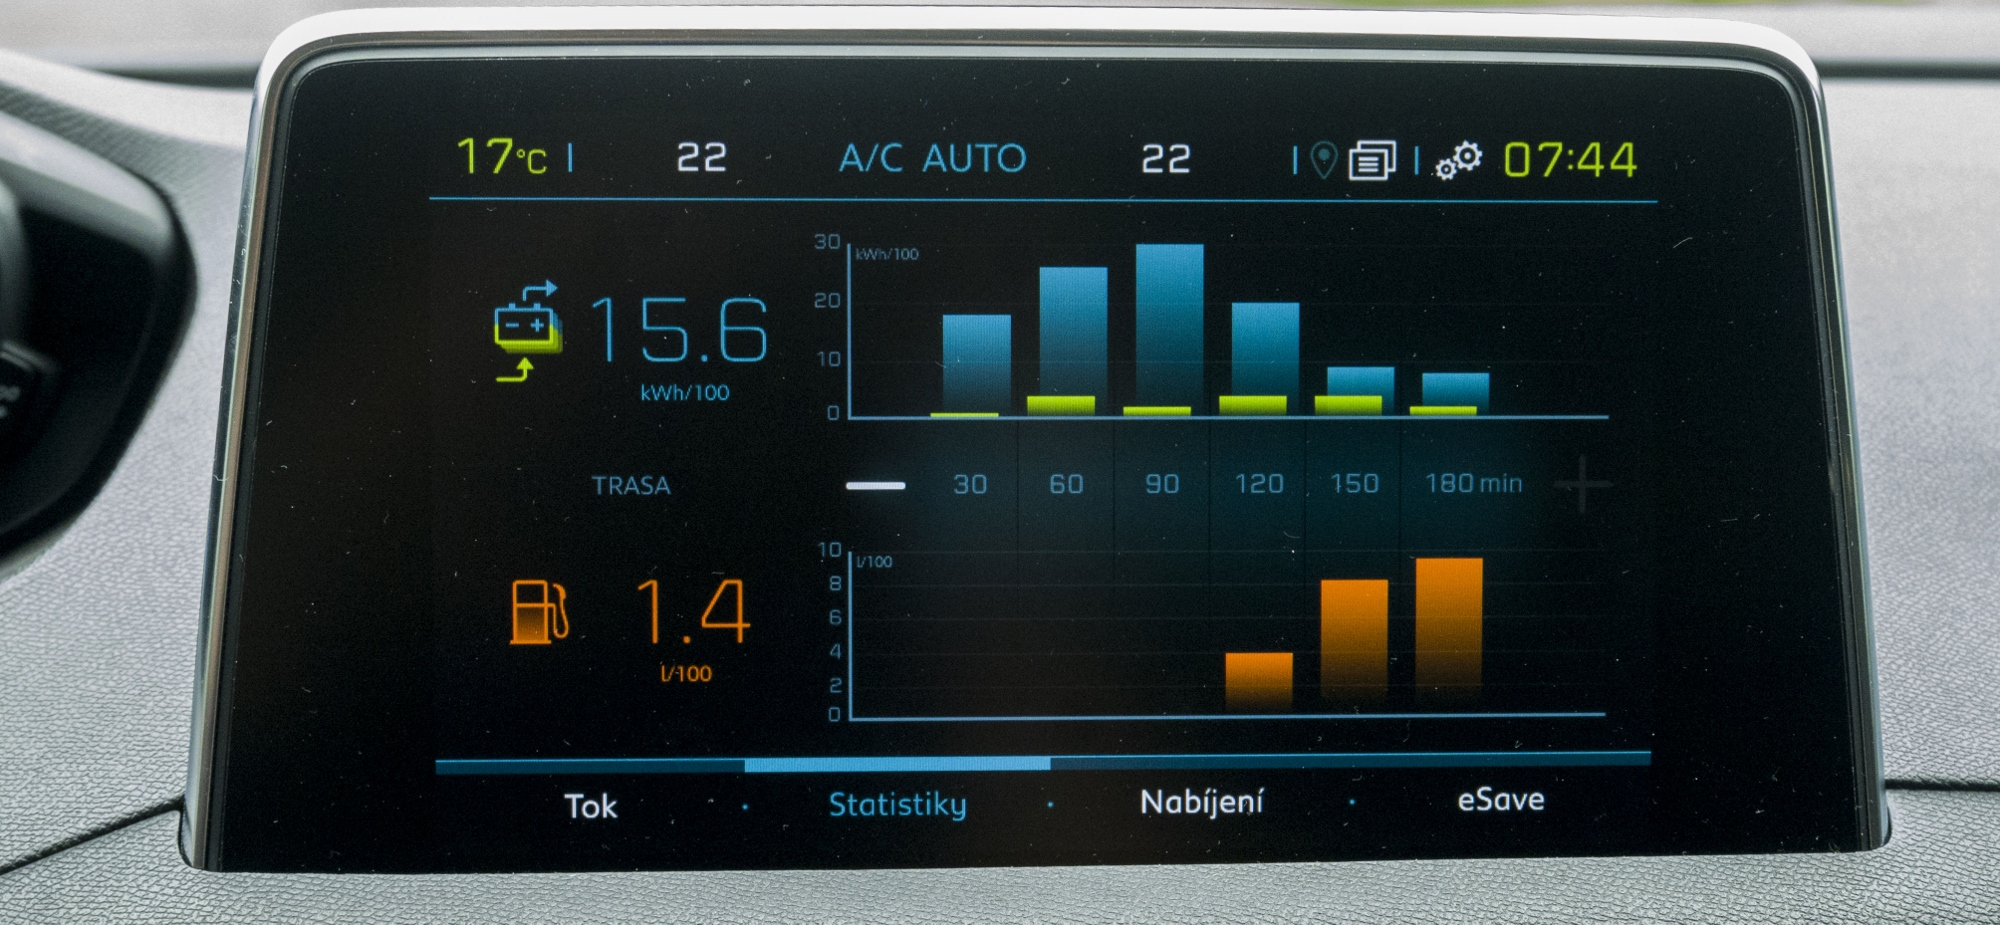 Test: Peugeot 3008 posúva schopnosti plug in hybridov nDcozJvpUi peugeot-3008-hybrid4-6